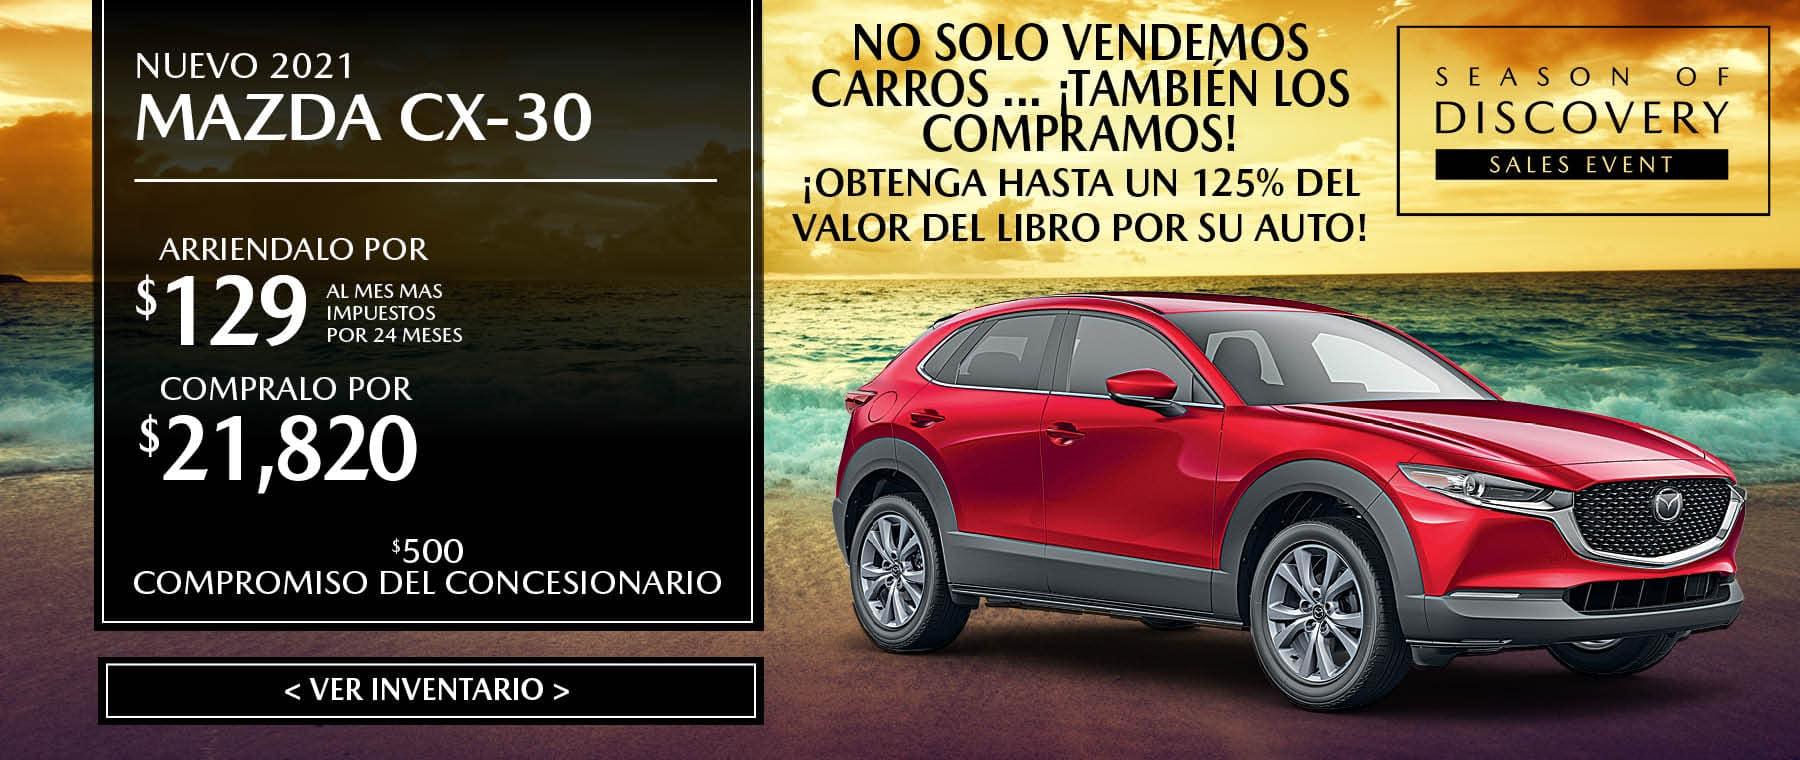 6.3.2021_CX30_Spanish